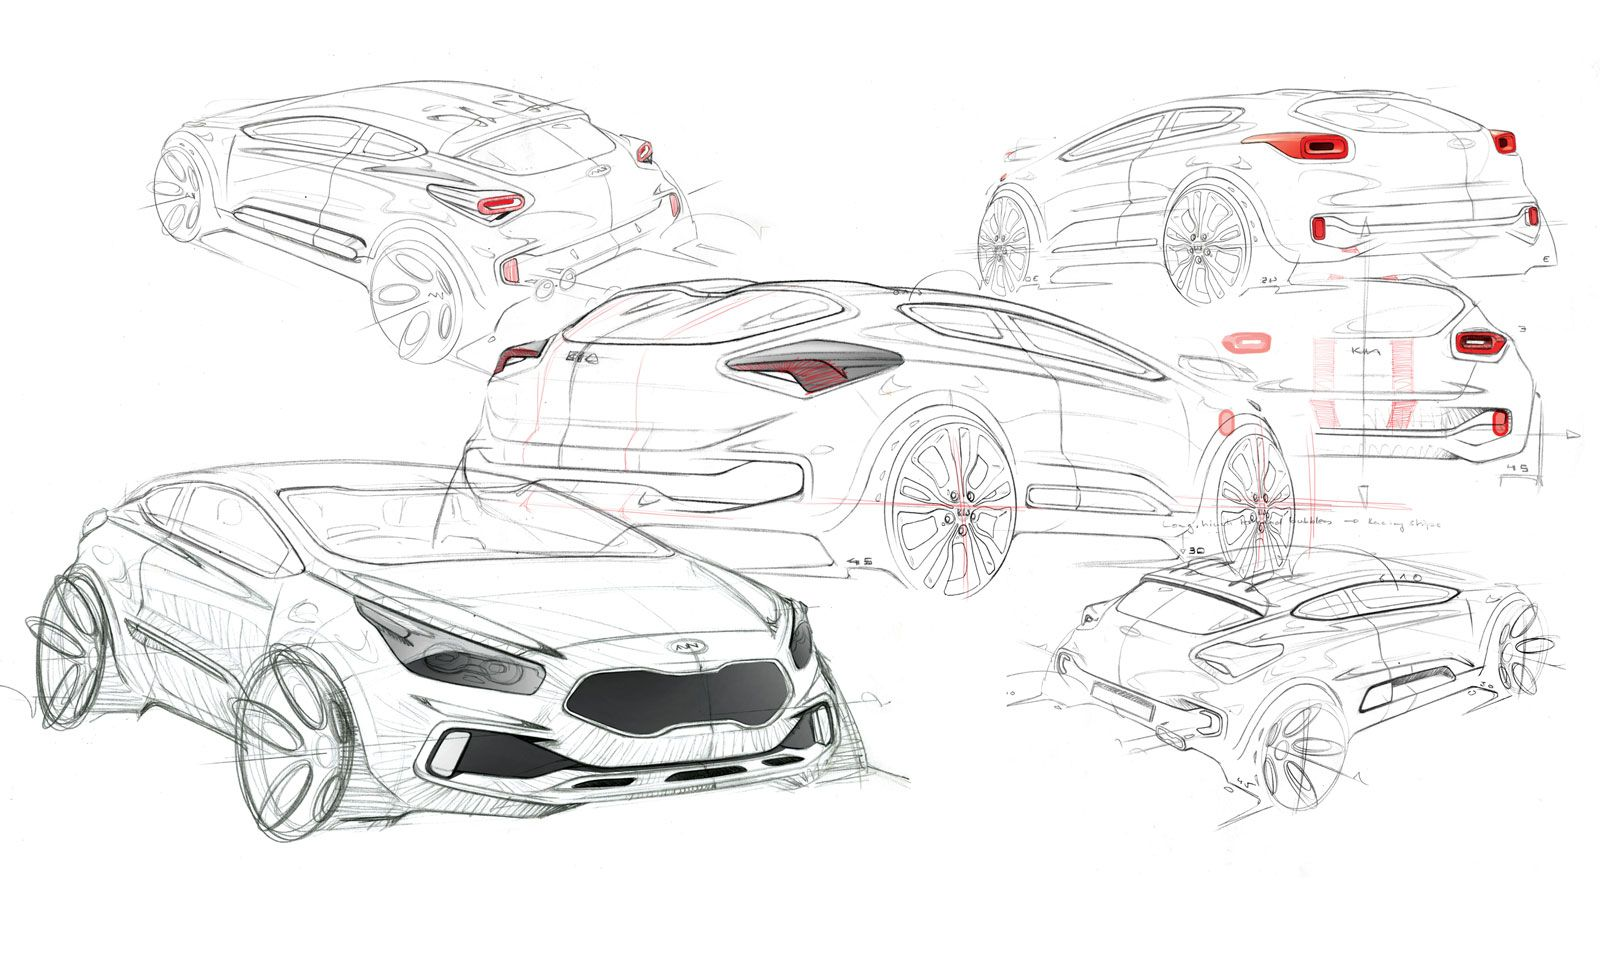 2012 Kia pro cee\'d - Design Sketch   sketches   Pinterest   Sketches ...